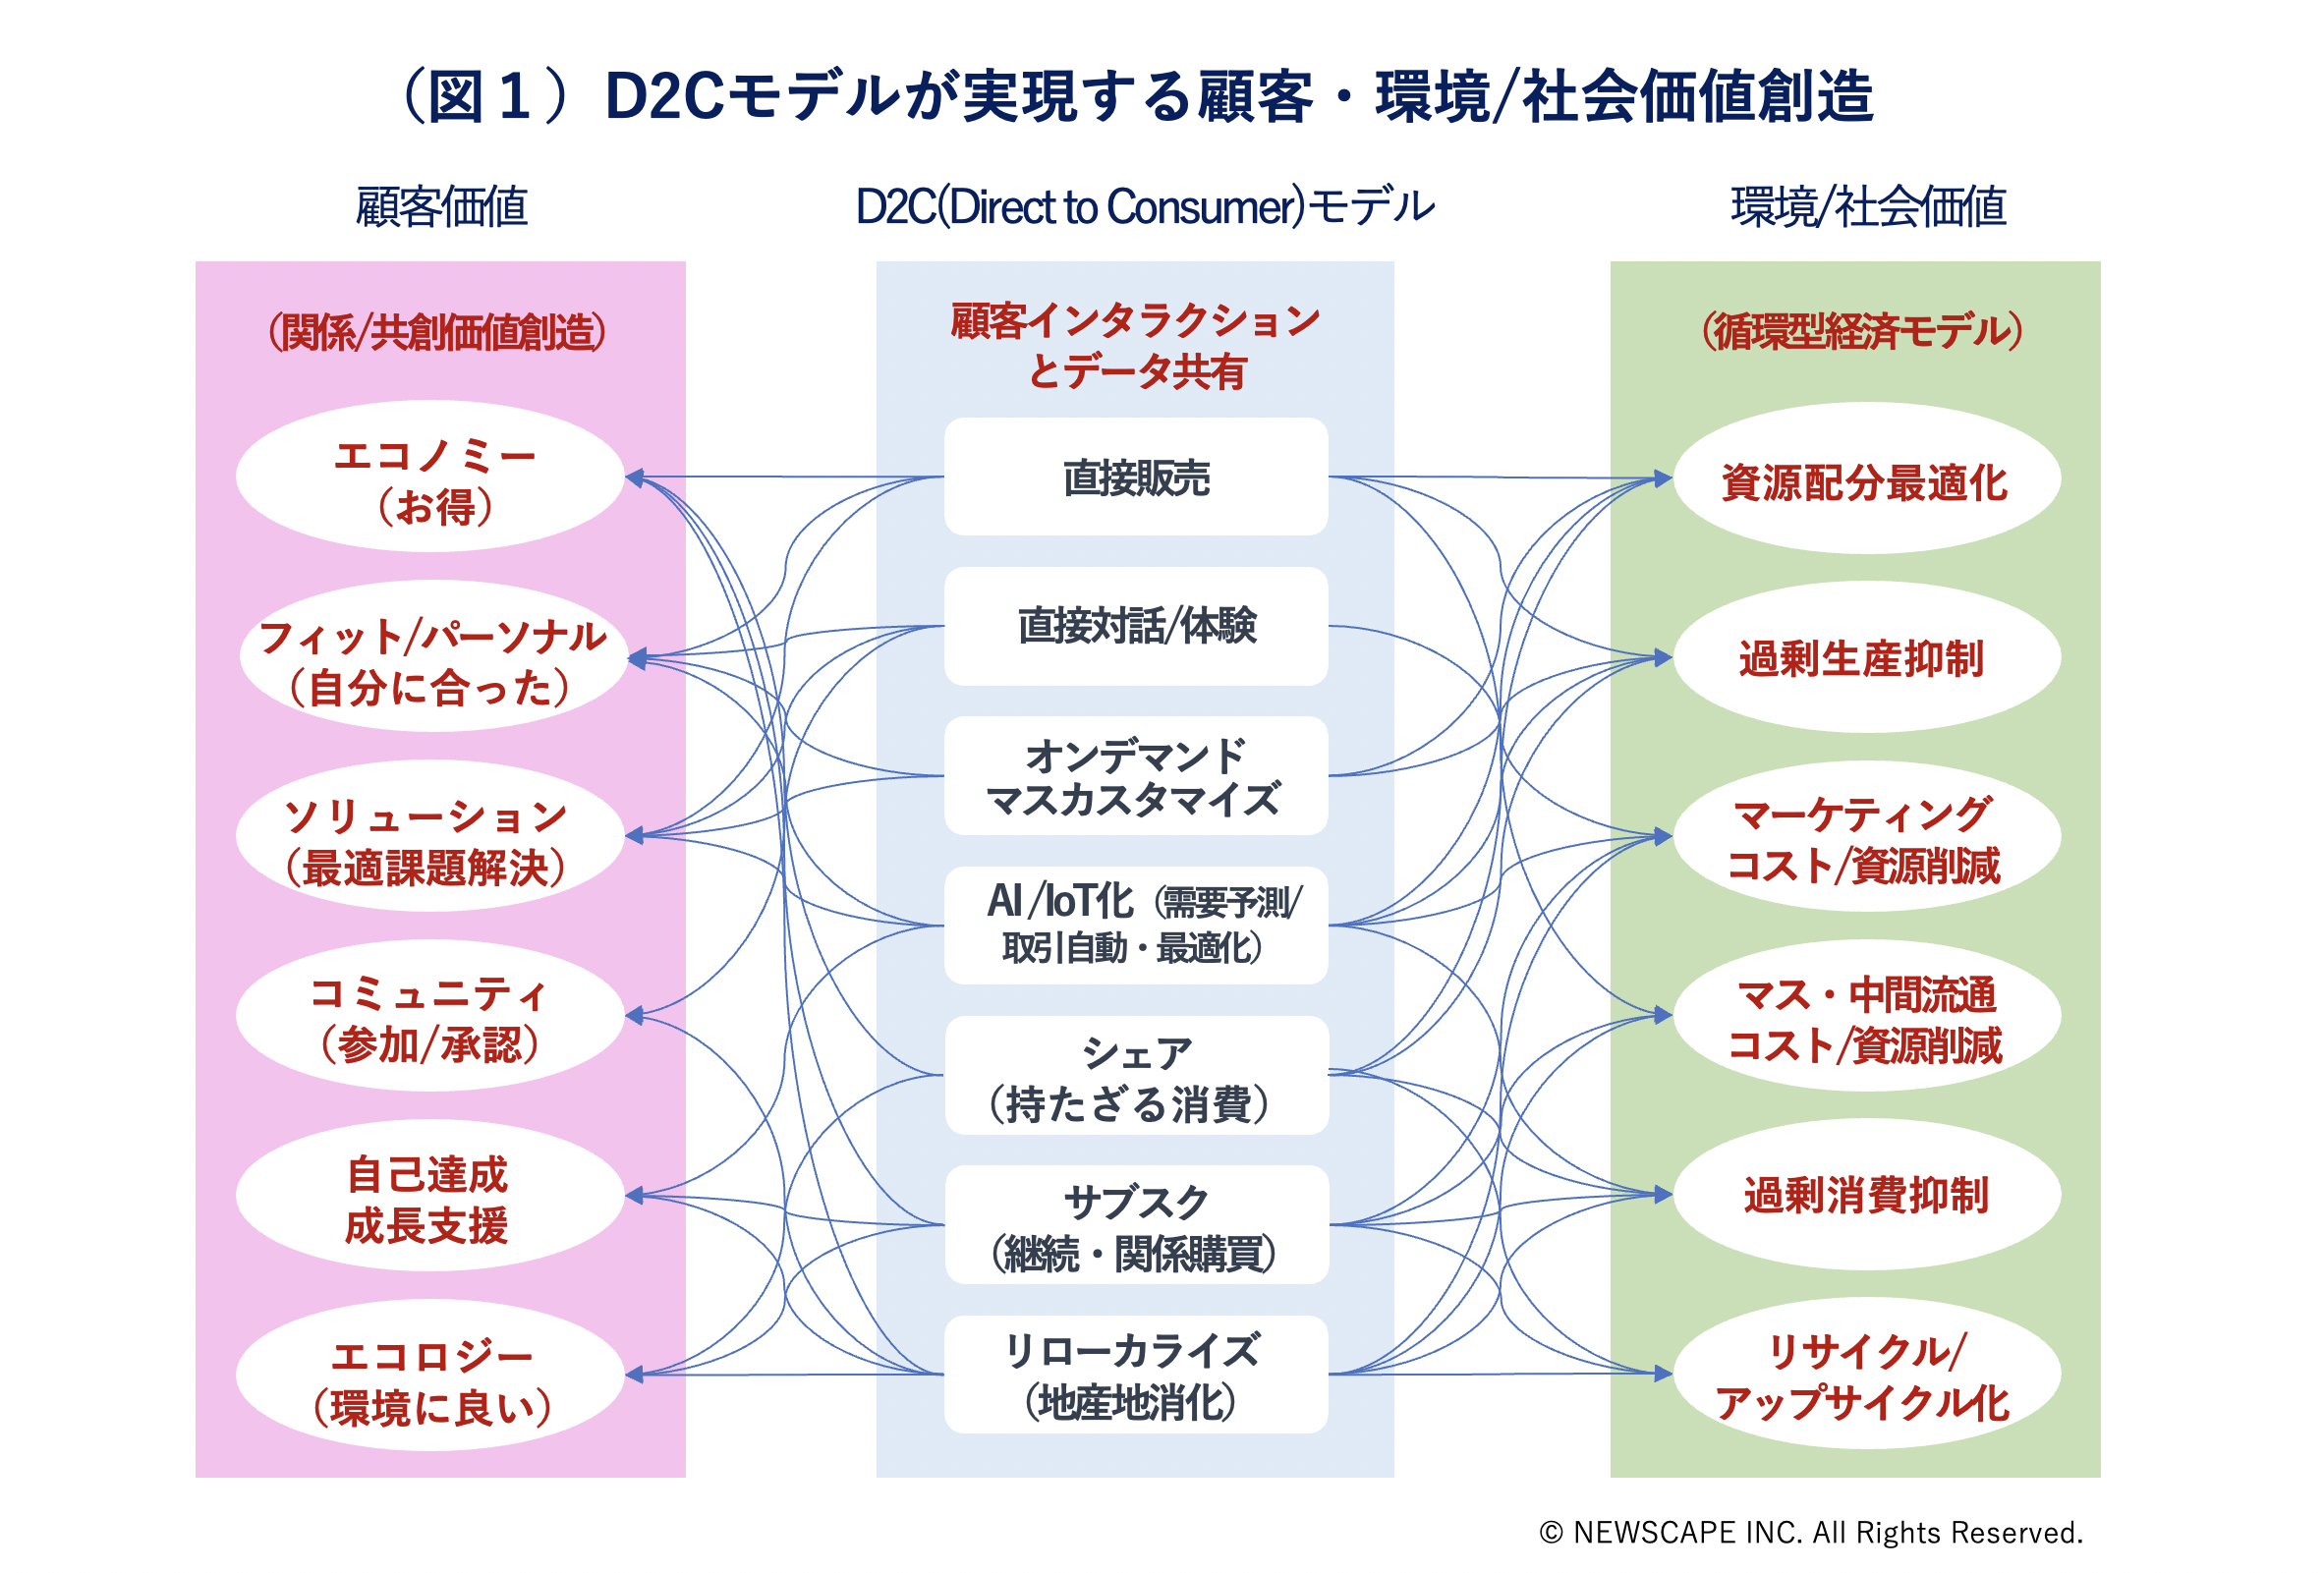 ●D2Cブランドビジネスが実現する価値転換① 顧客価値共創と、循環型経済システムへの事業シフト